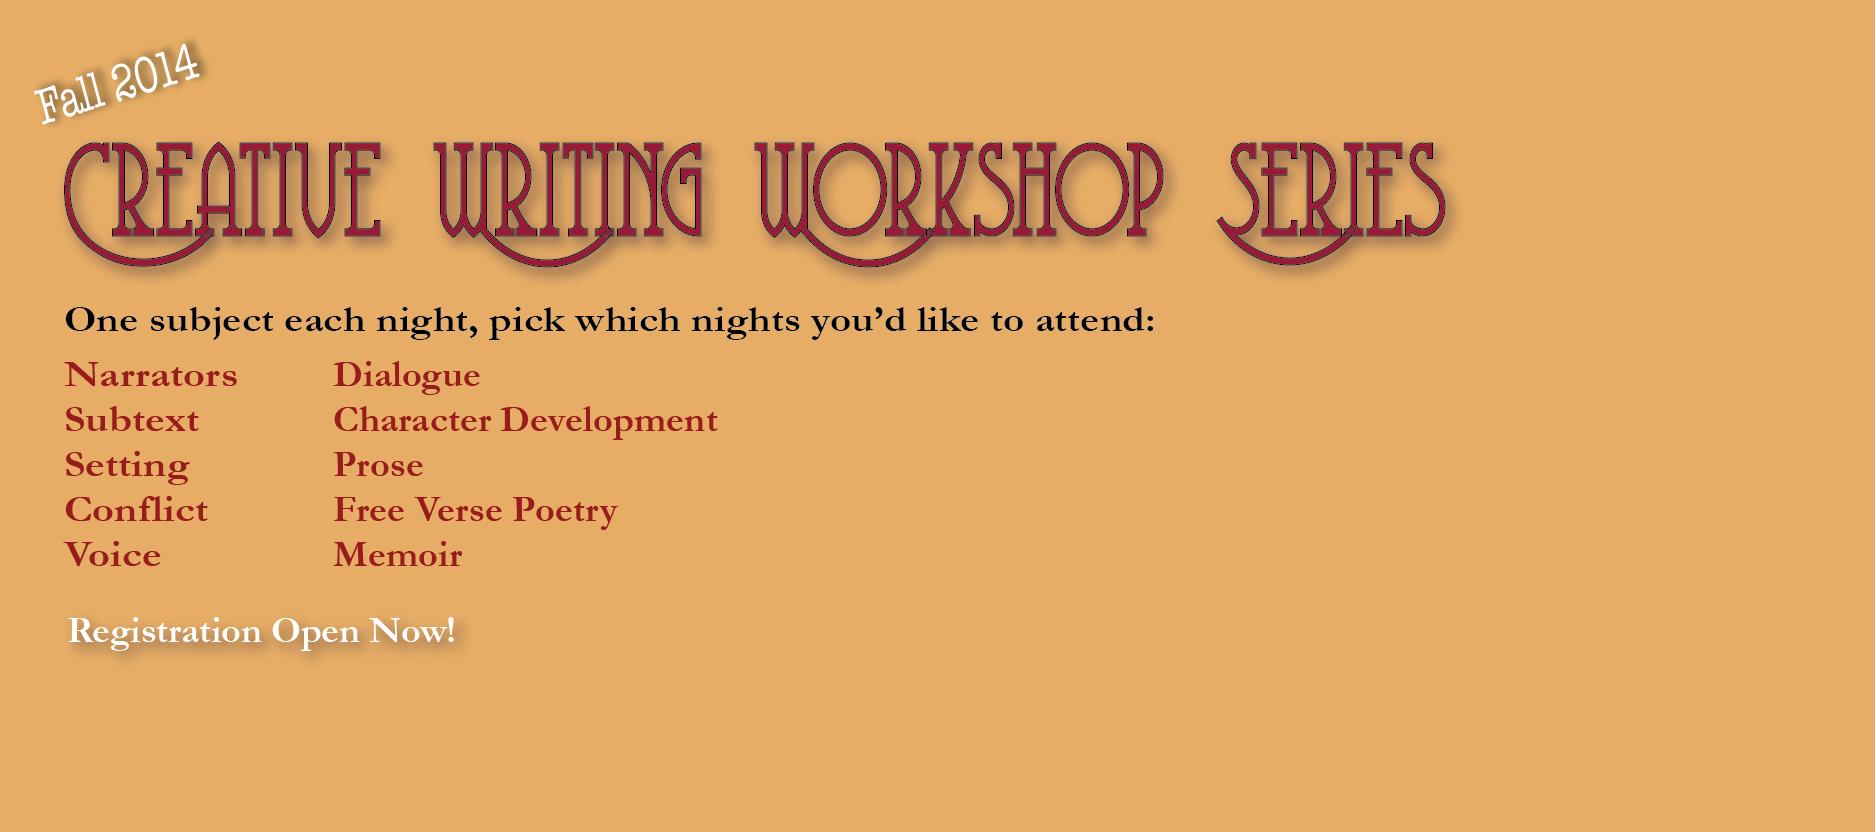 Creative-Writing-Workshop-Series-Fall-2014